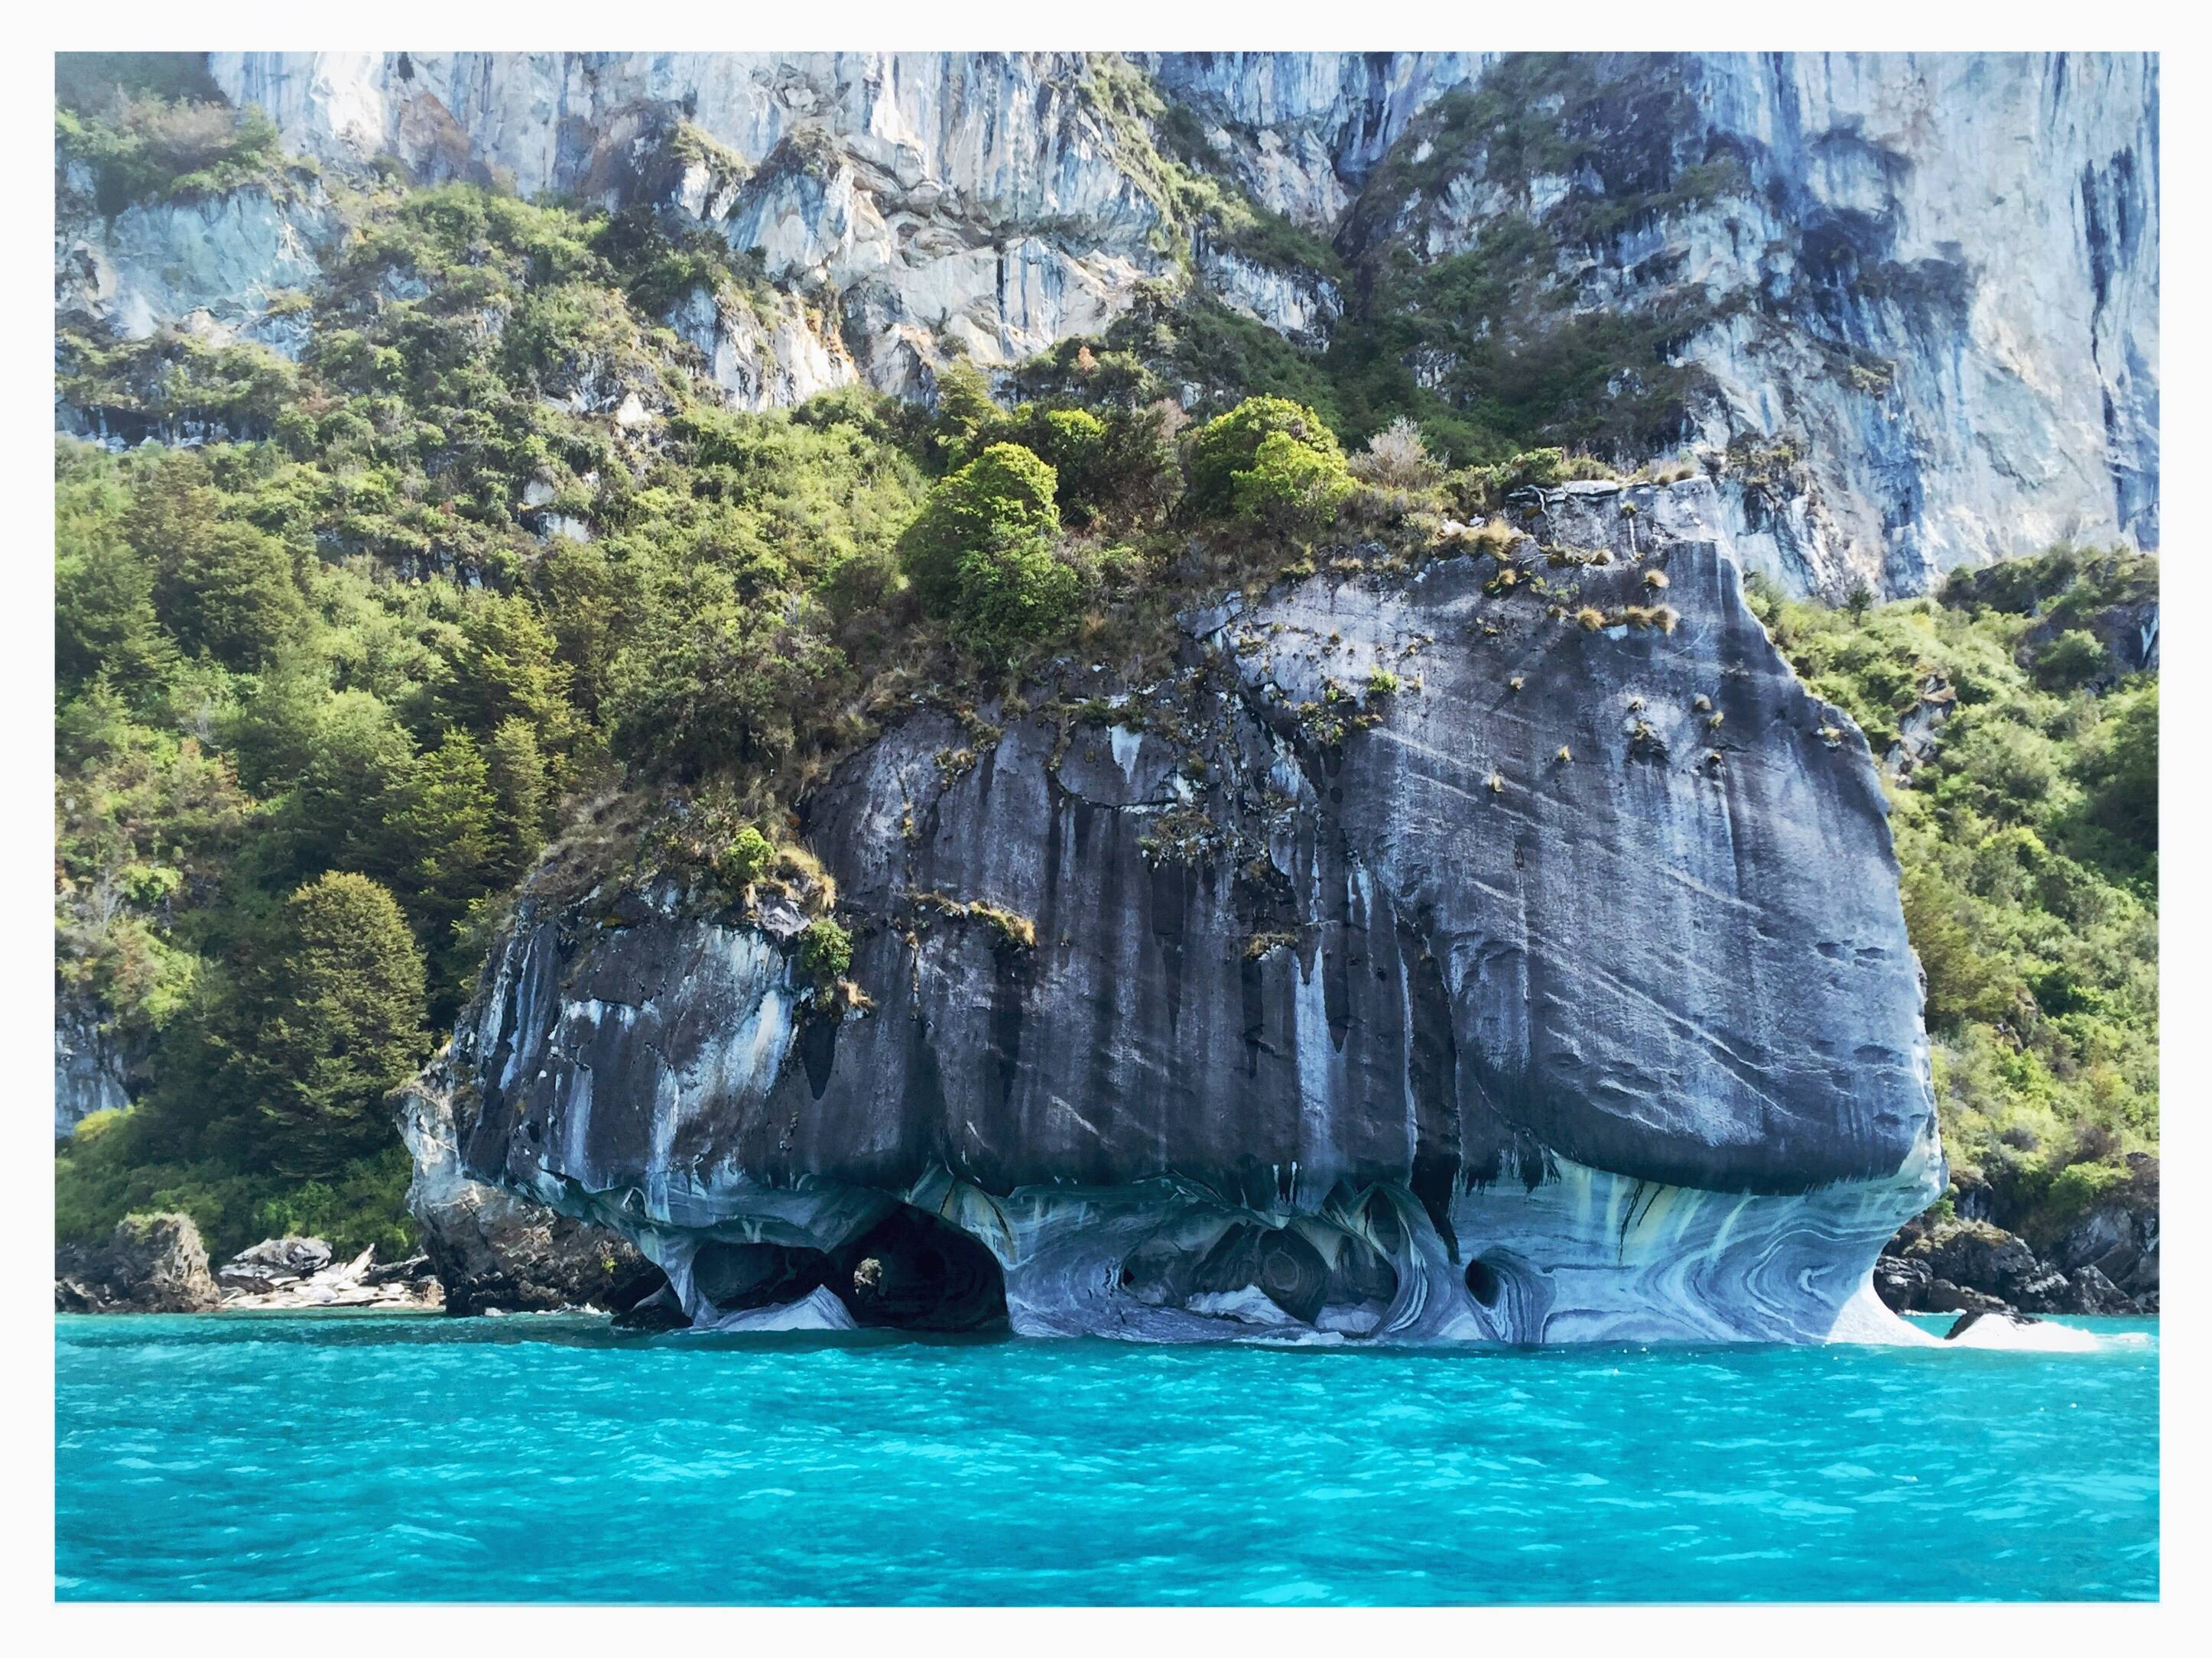 Photo 1: Lago General Carrera, l'eau turquoise de Bora Bora 30° en moins